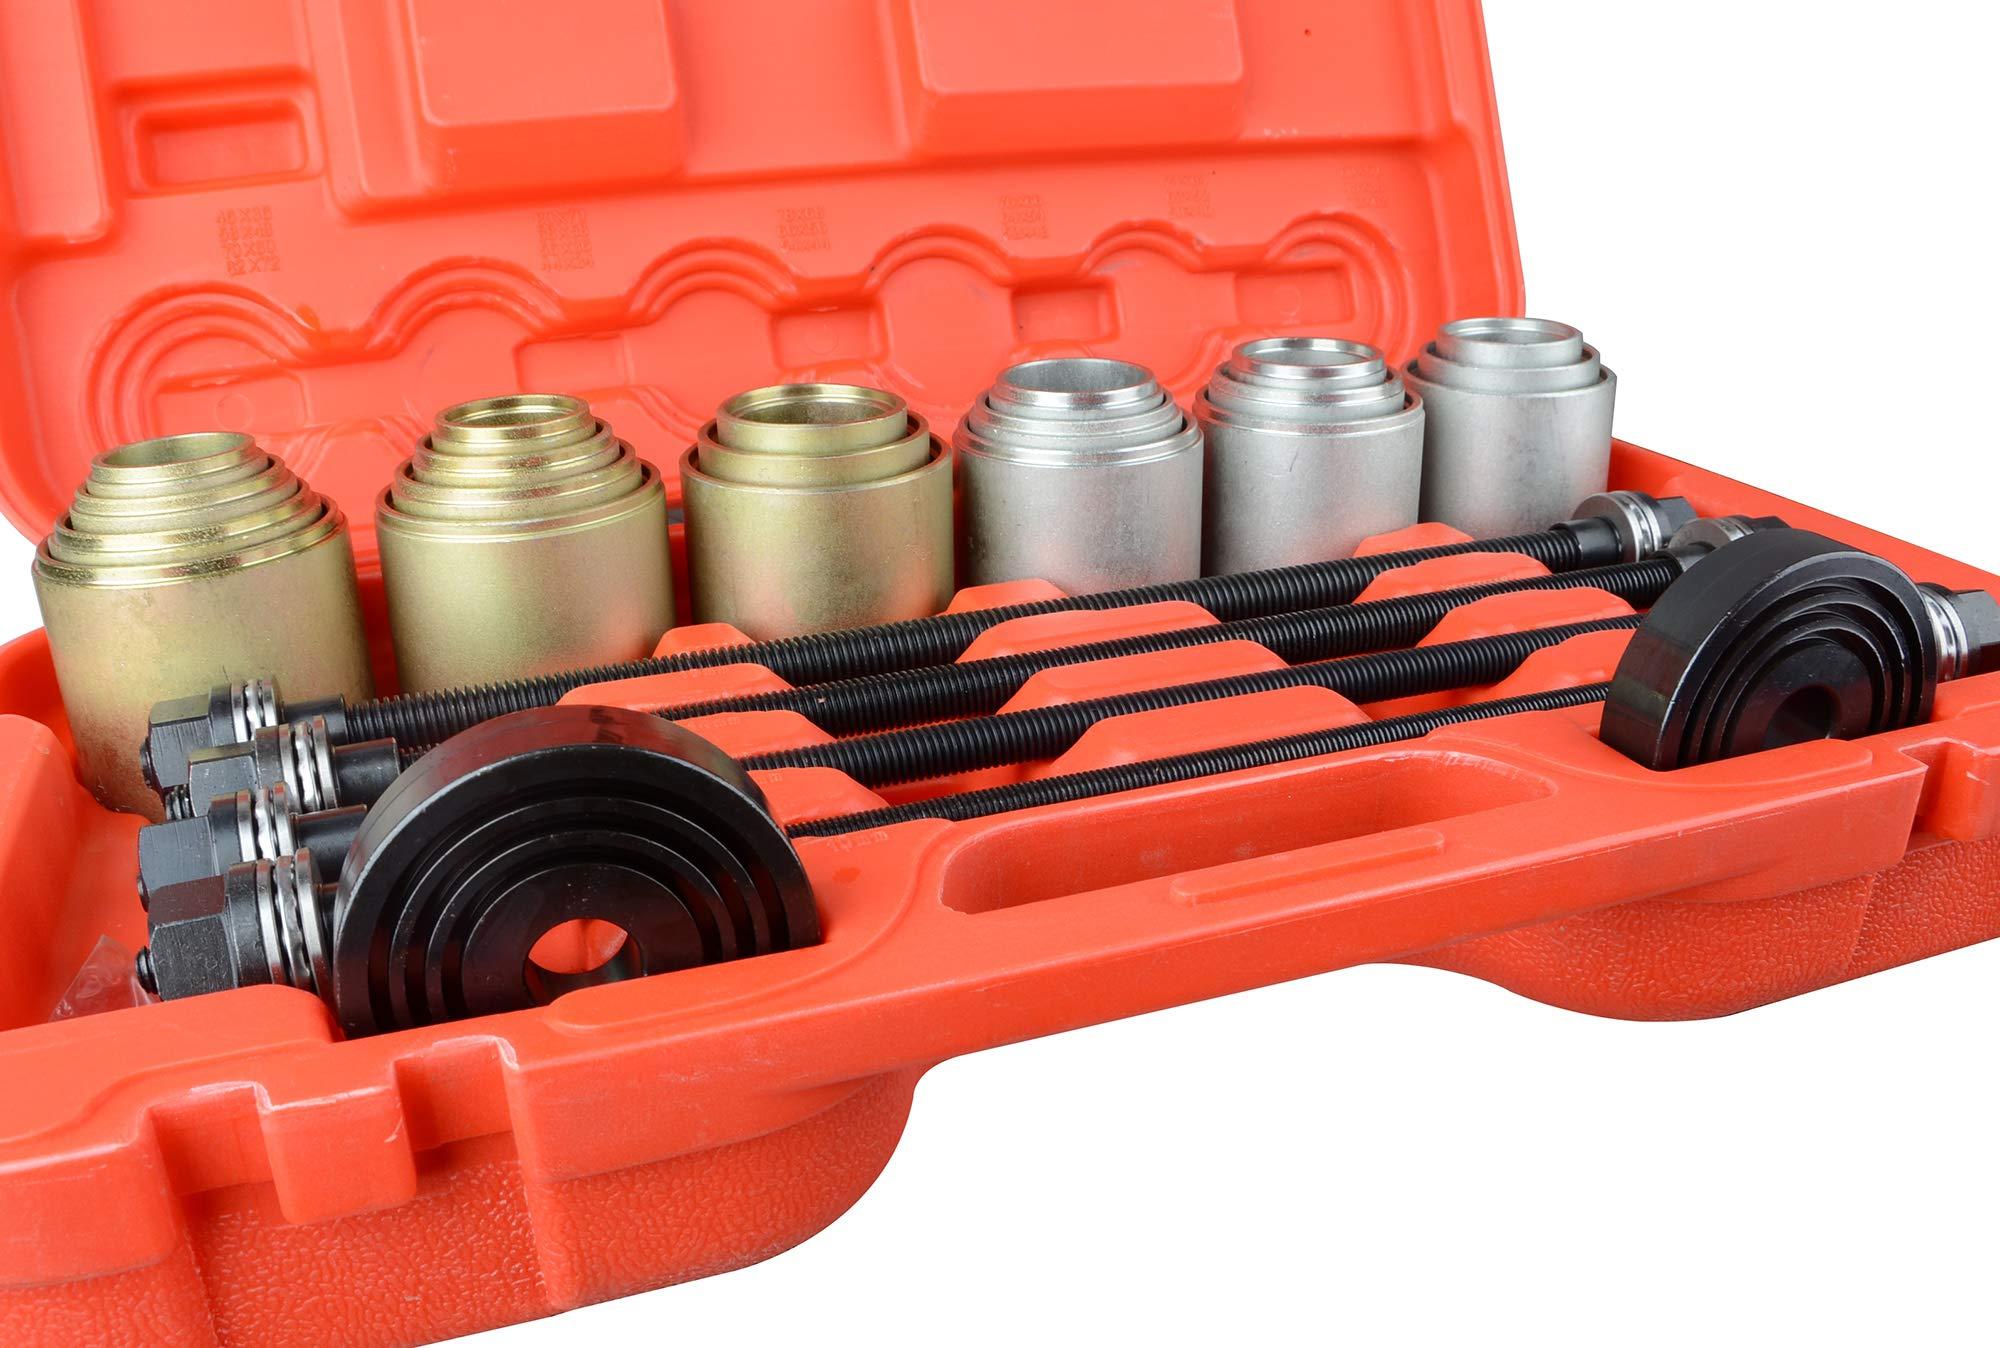 DA YUAN Universal Press and Pull Sleeve Remove Install Bushes Bearings Garage Tool Kit by DA YUAN (Image #3)